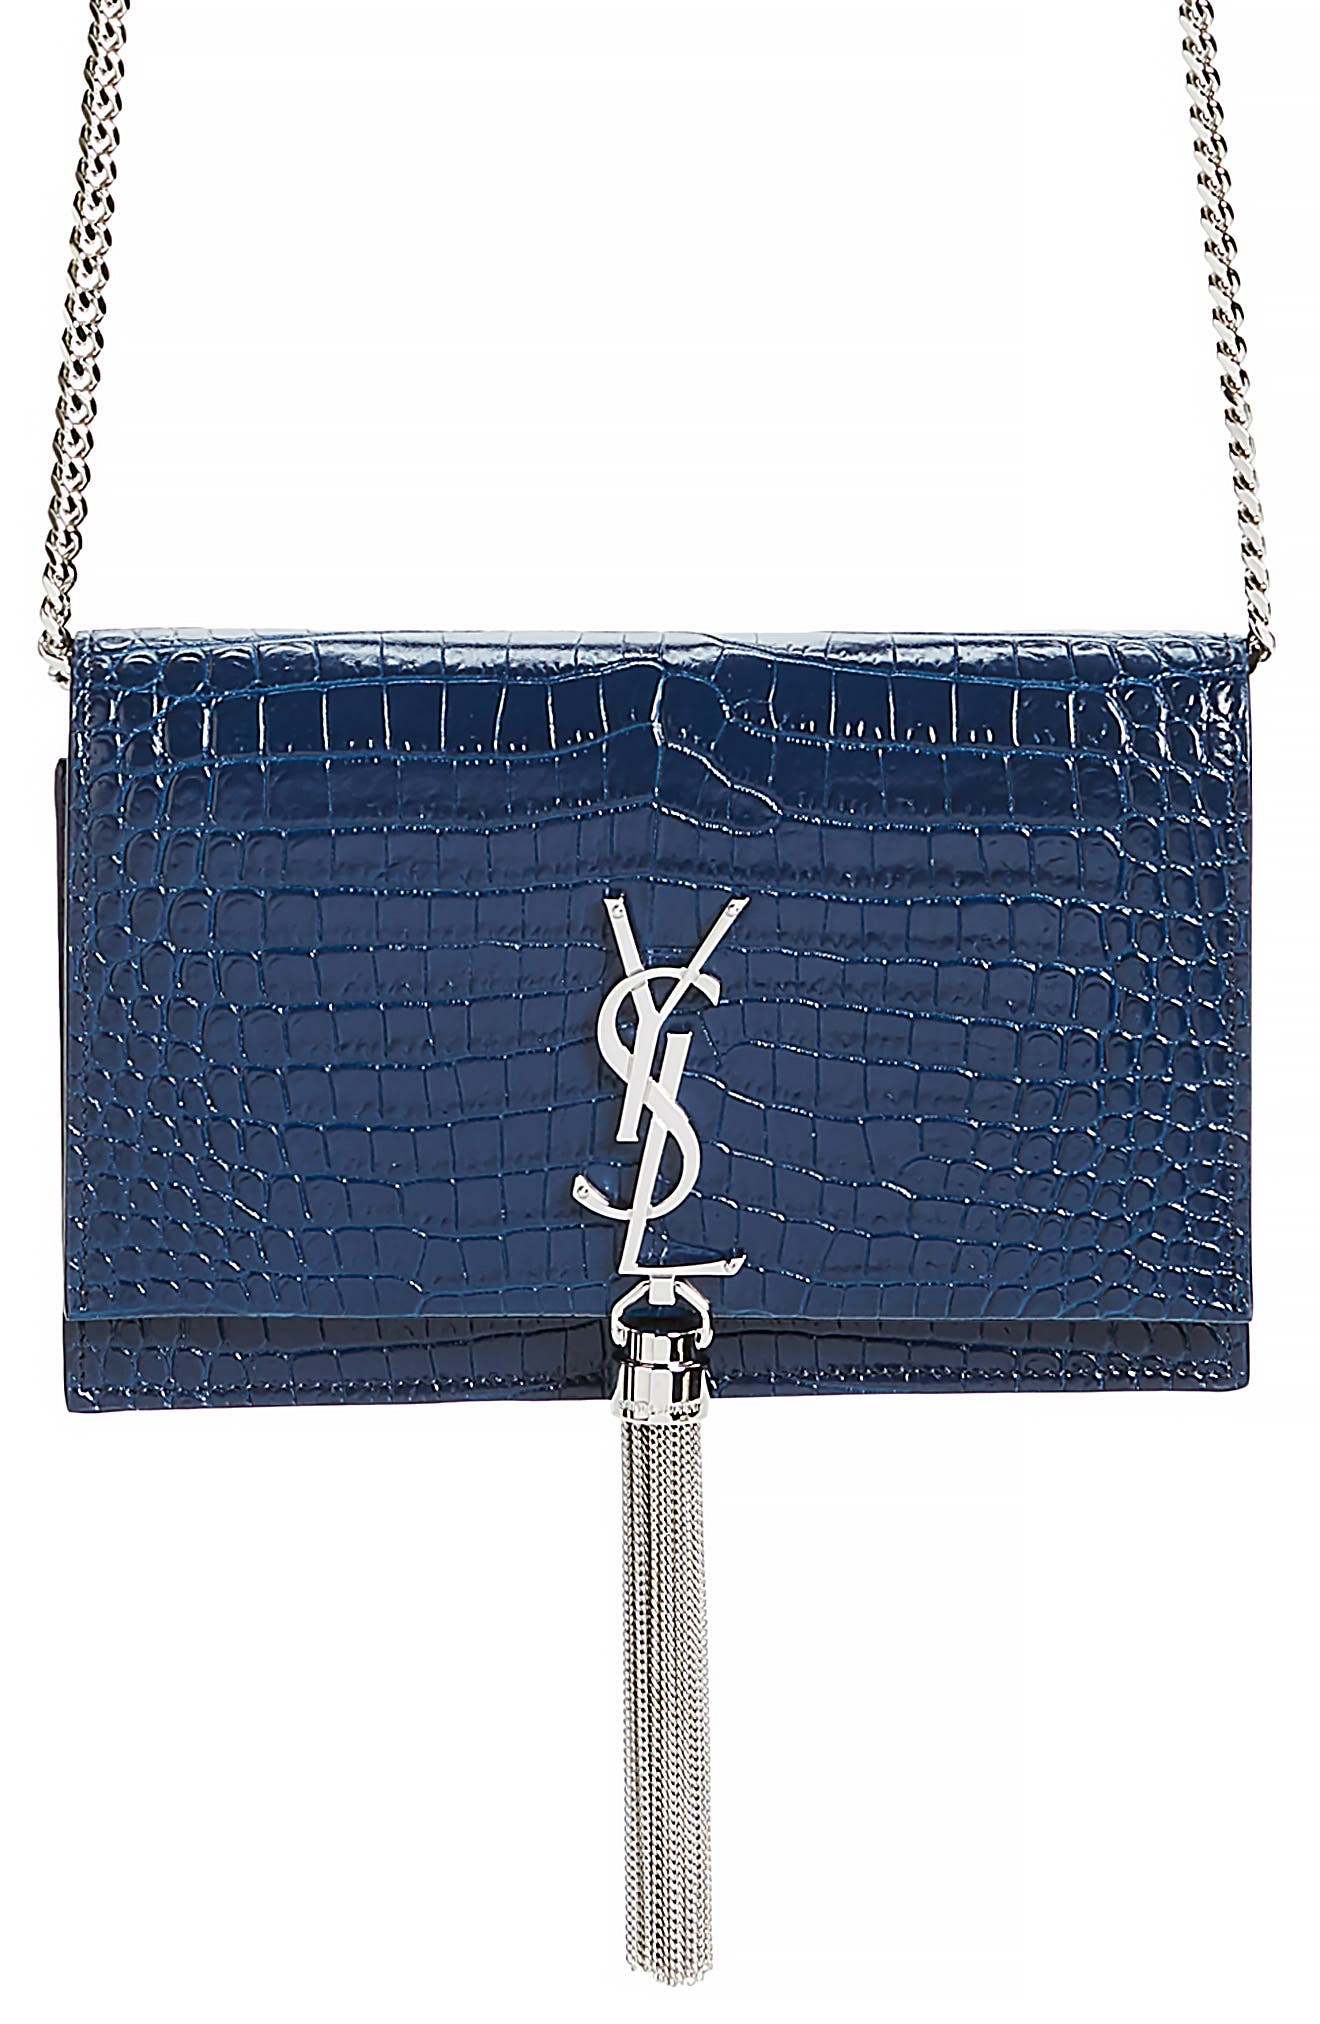 Kate Croc Embossed Leather Wallet on a Chain,                         Main,                         color, DENIM BLUE/ DENIM BLUE